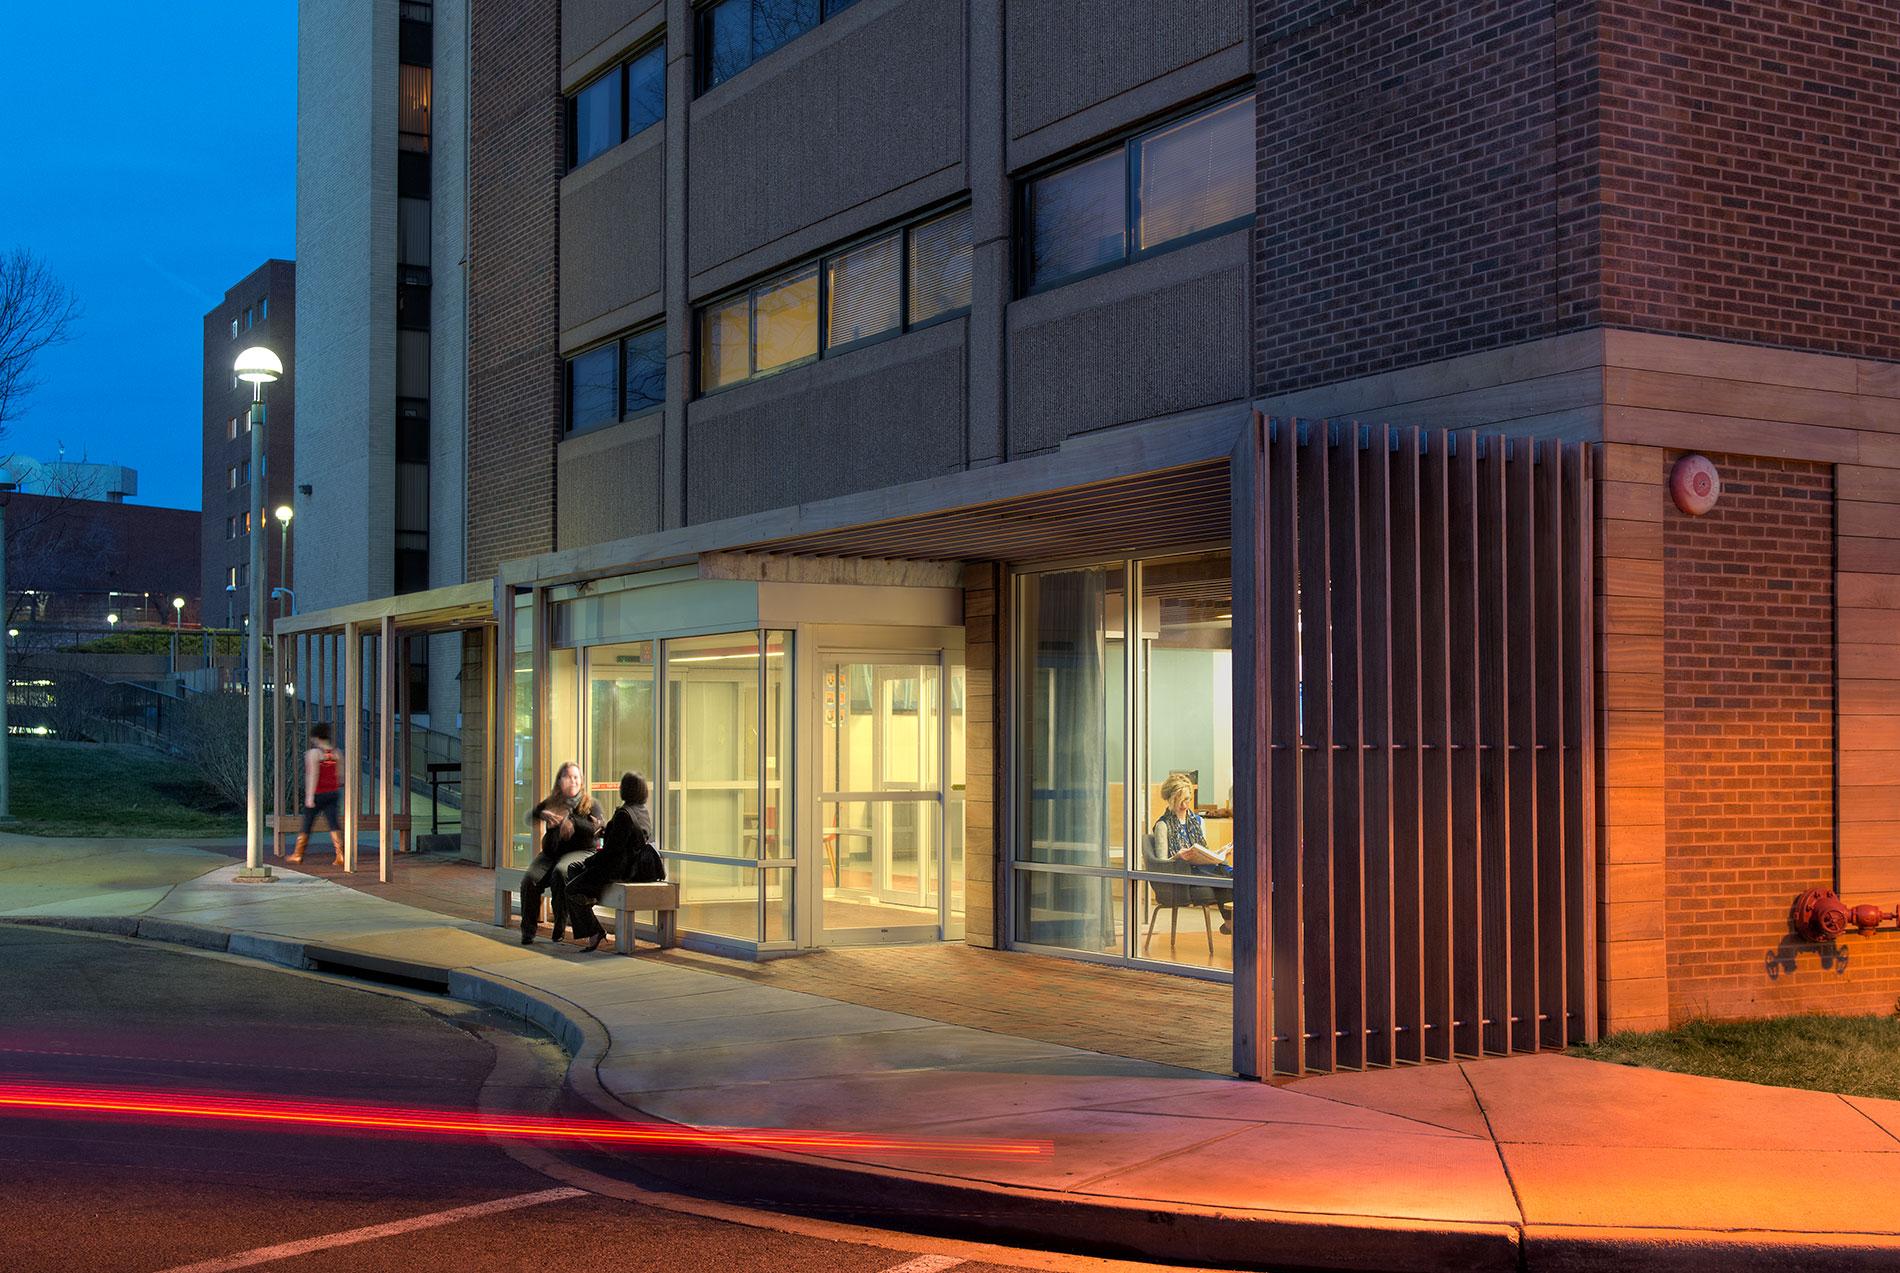 Gallaudet University Design for Communication Studio Twenty Seven Architecture Benson Hall